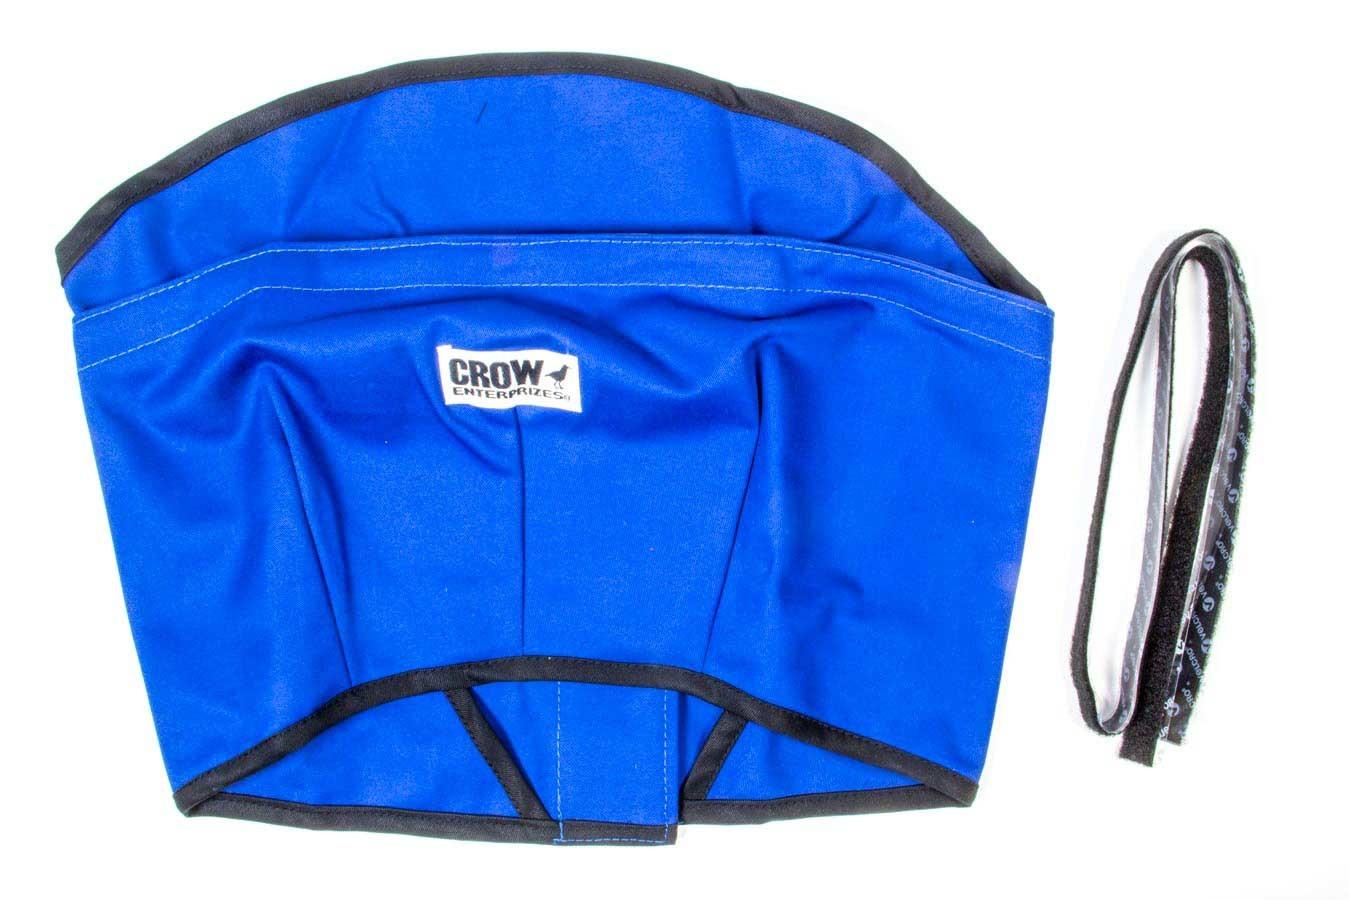 Crow Enterprizes Helmet Skirt Blue Velcro Attachment